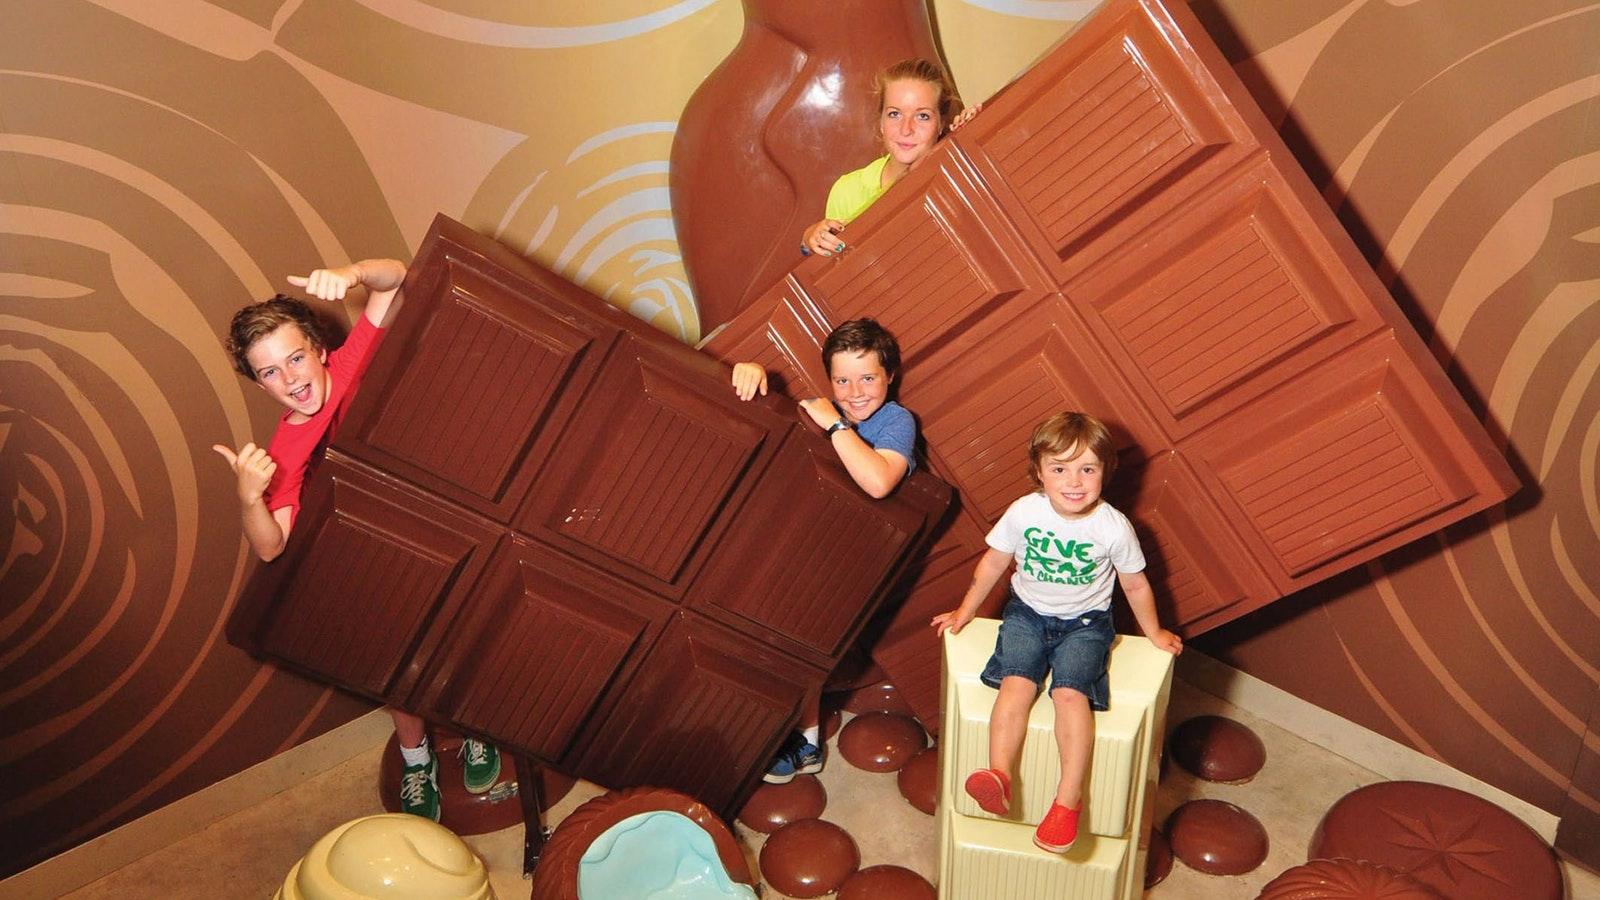 Pannys Giant Chocolate Photo Room